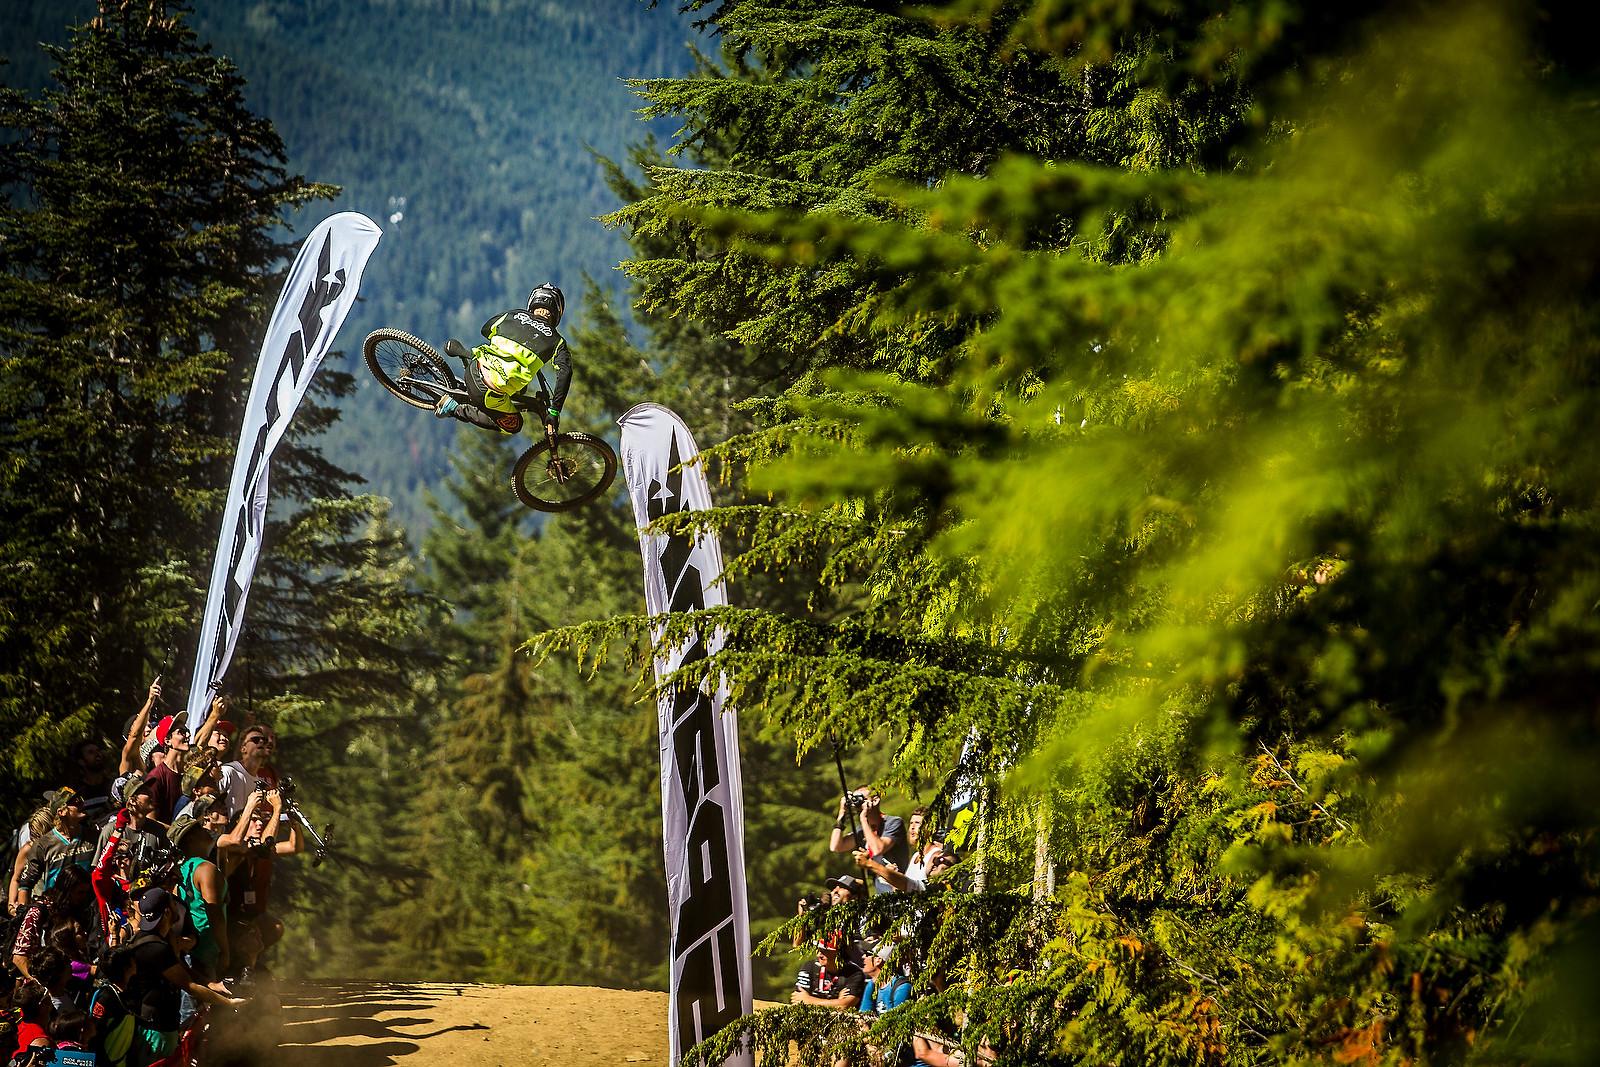 Mitch Ropelato - Whip Off World Champs Photo Blast - Mountain Biking Pictures - Vital MTB